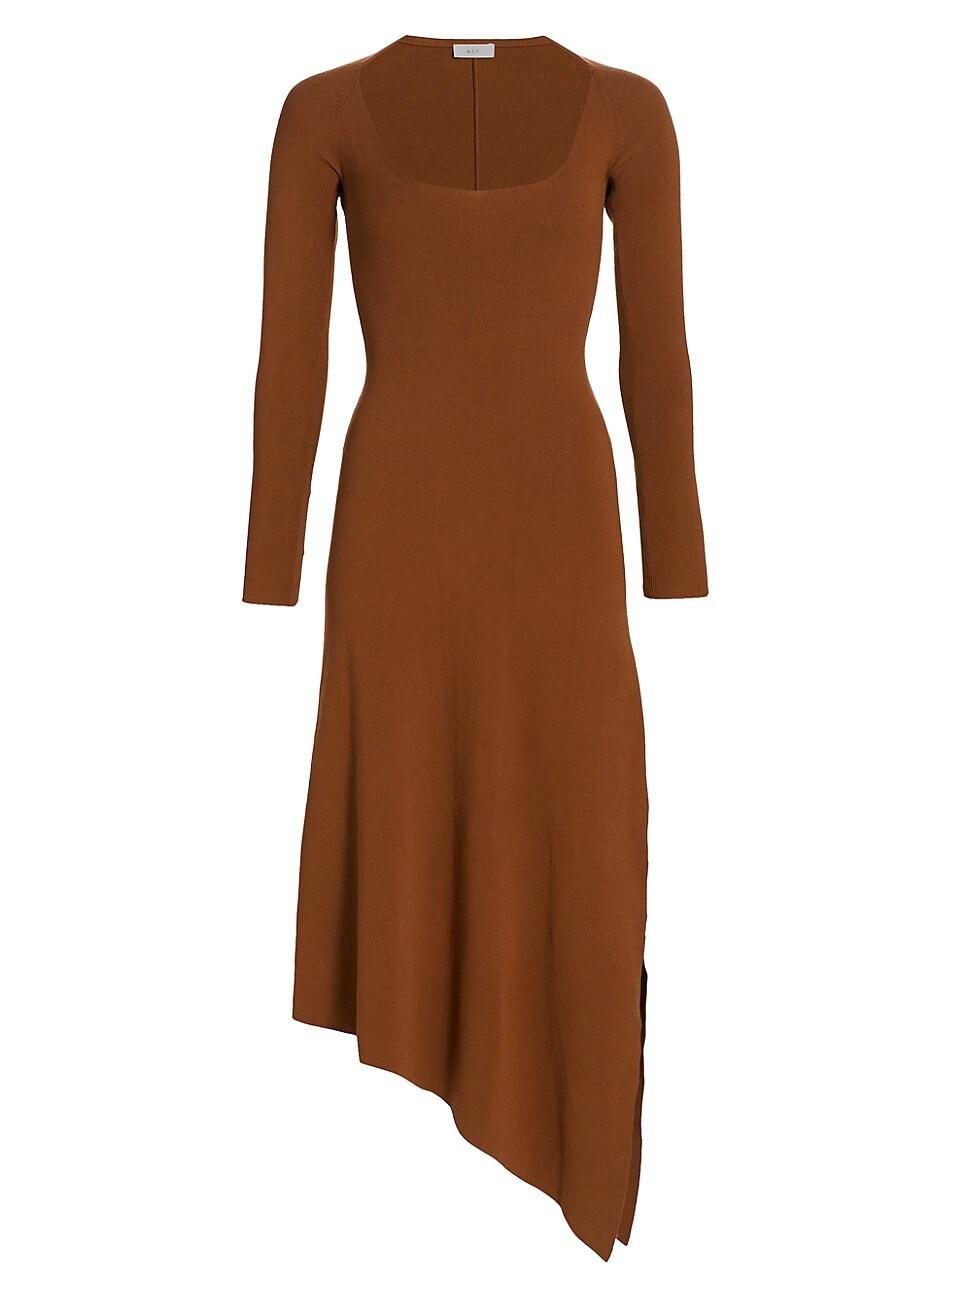 A.l.c WOMEN'S HARVEY ASYMMETRICAL DRESS